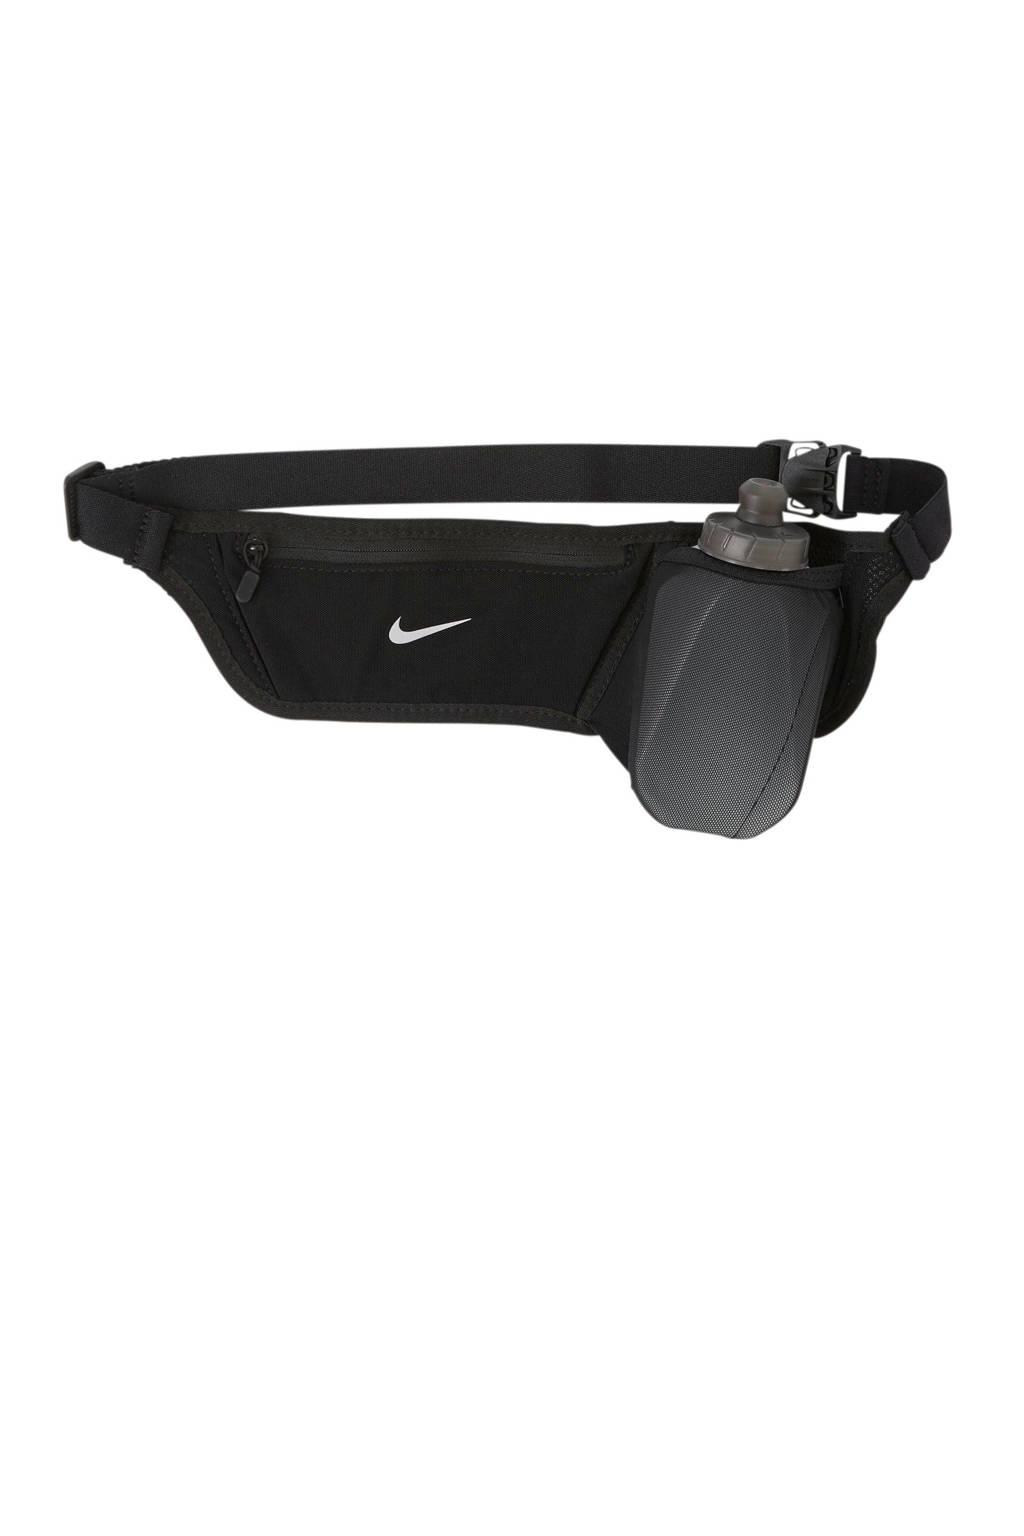 Nike heuptas Pocket Flask Belt 10OZ zwart